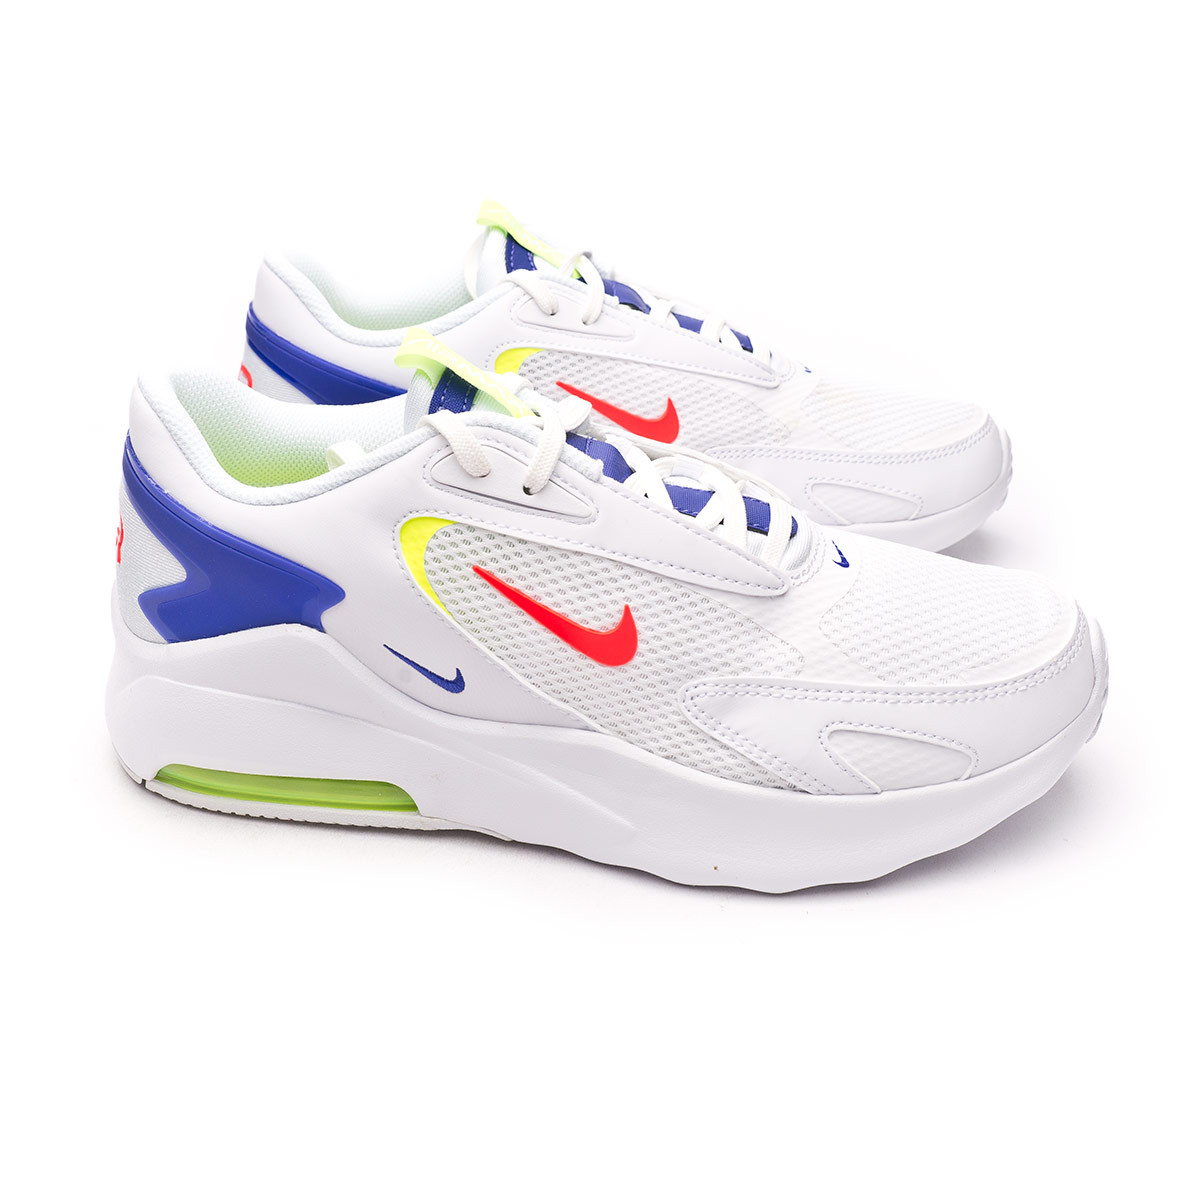 Nike Air Max Bolt AMD Trainers